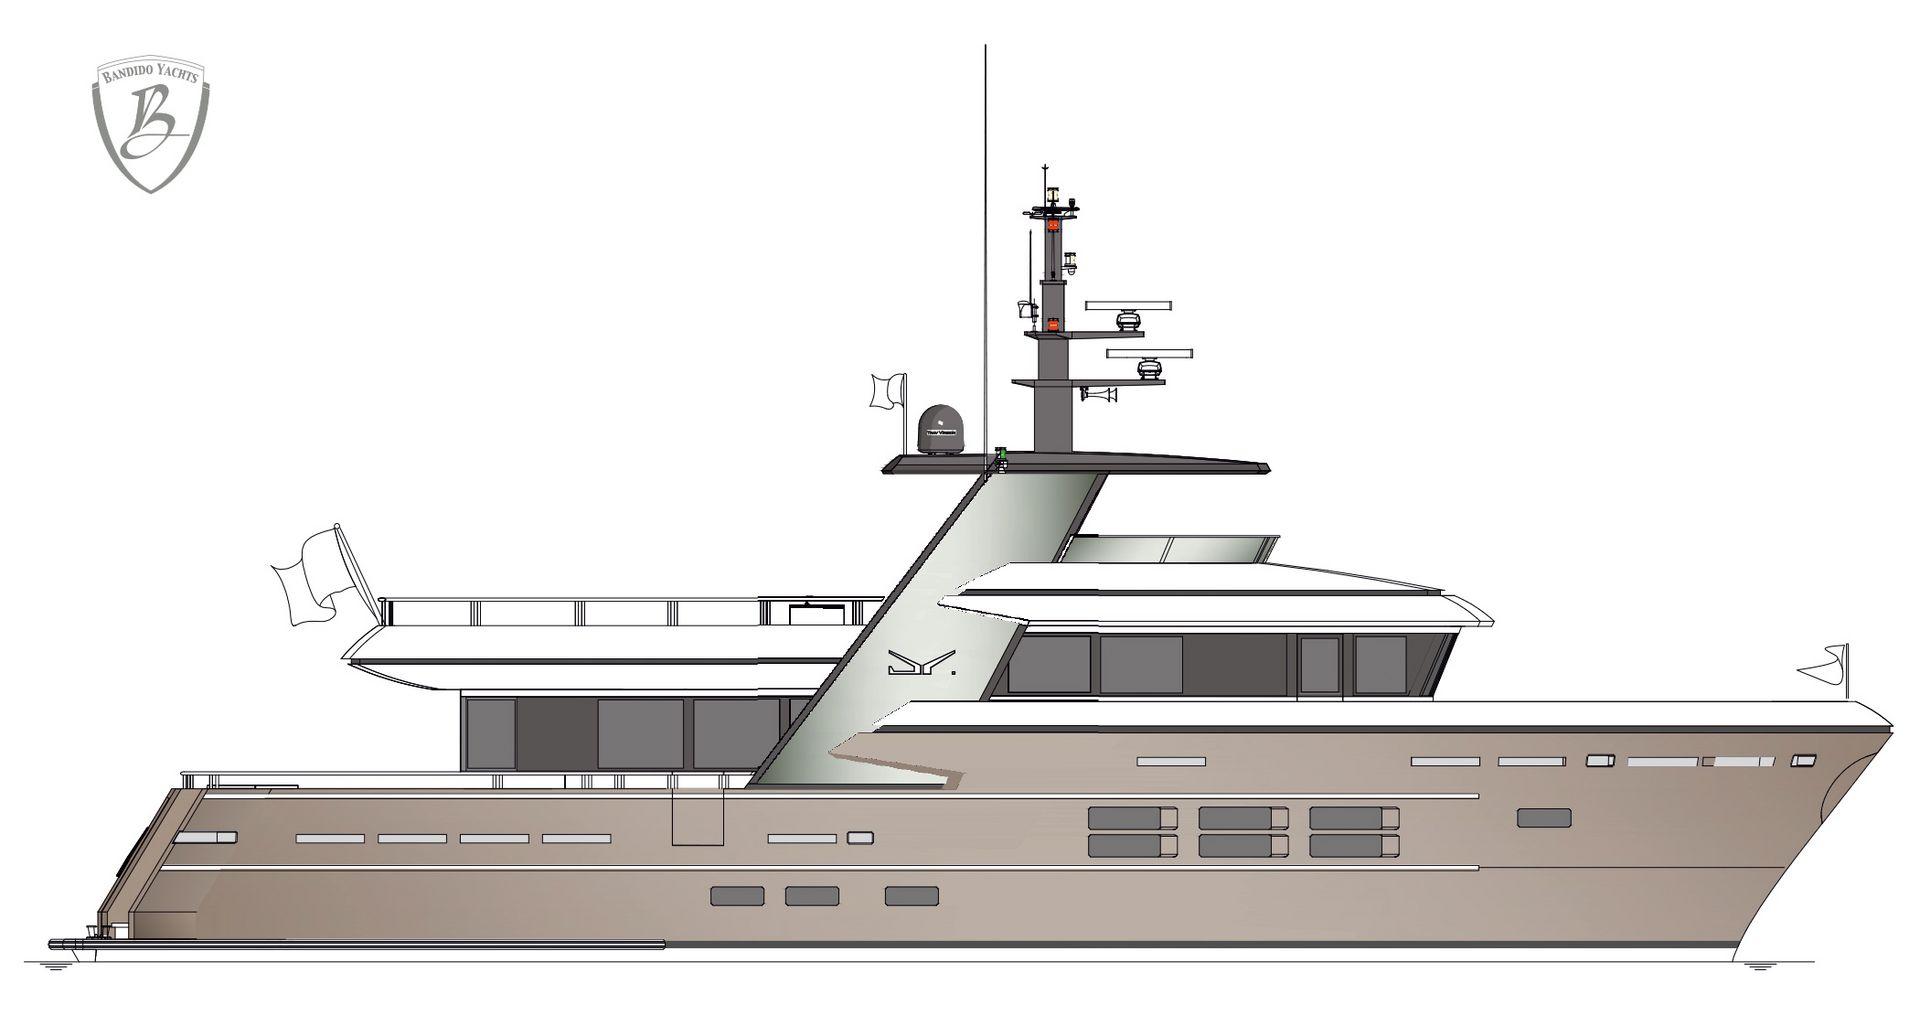 Bandido 90 - Bandido Yachts by Drettmann - Drettmann Yachts